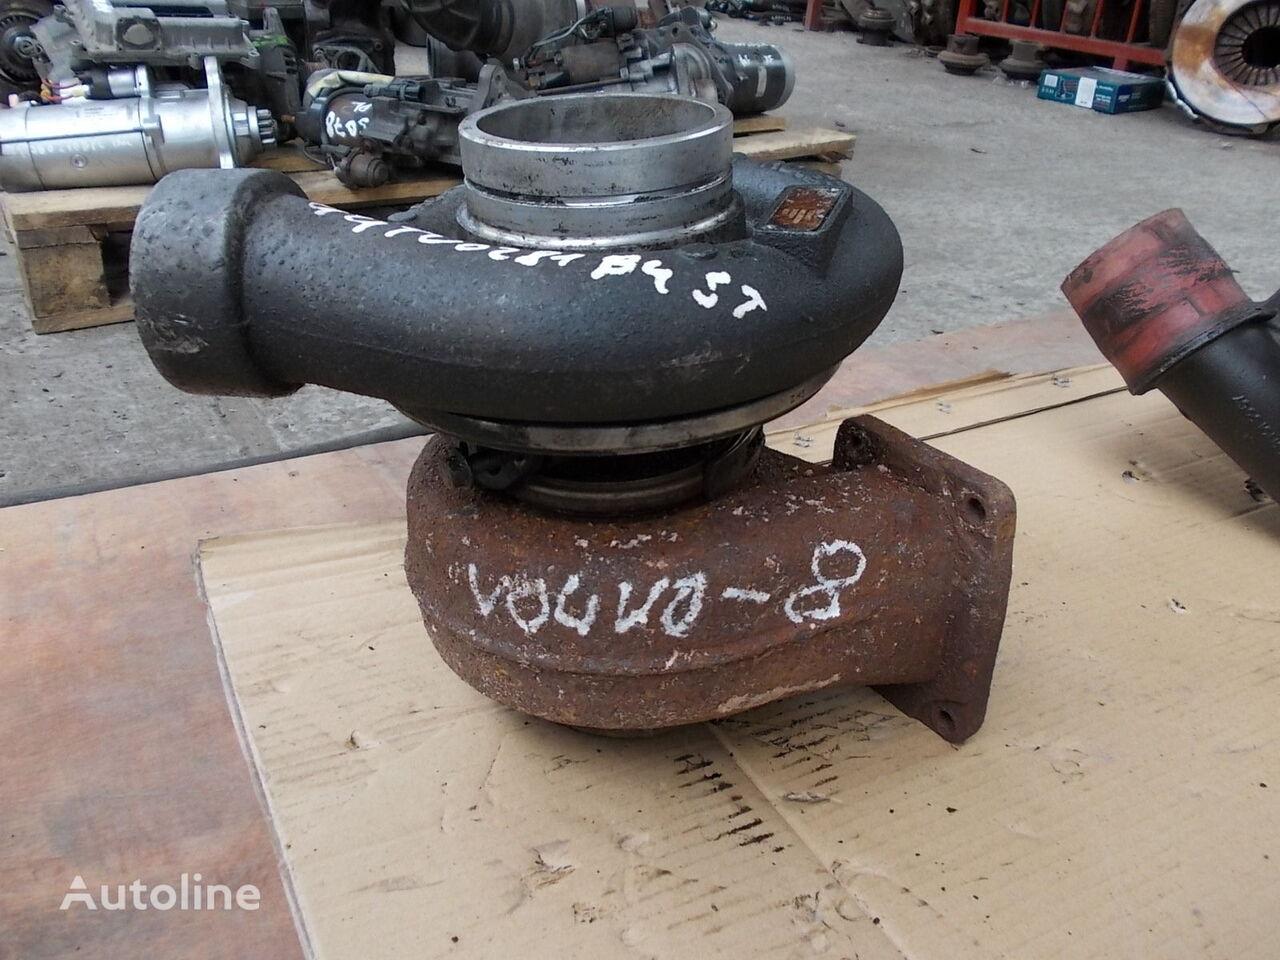 VOLVO 3537840/3575237/3531858 HOLSET turbocompresor para motor para VOLVO FH12 420KM tractora